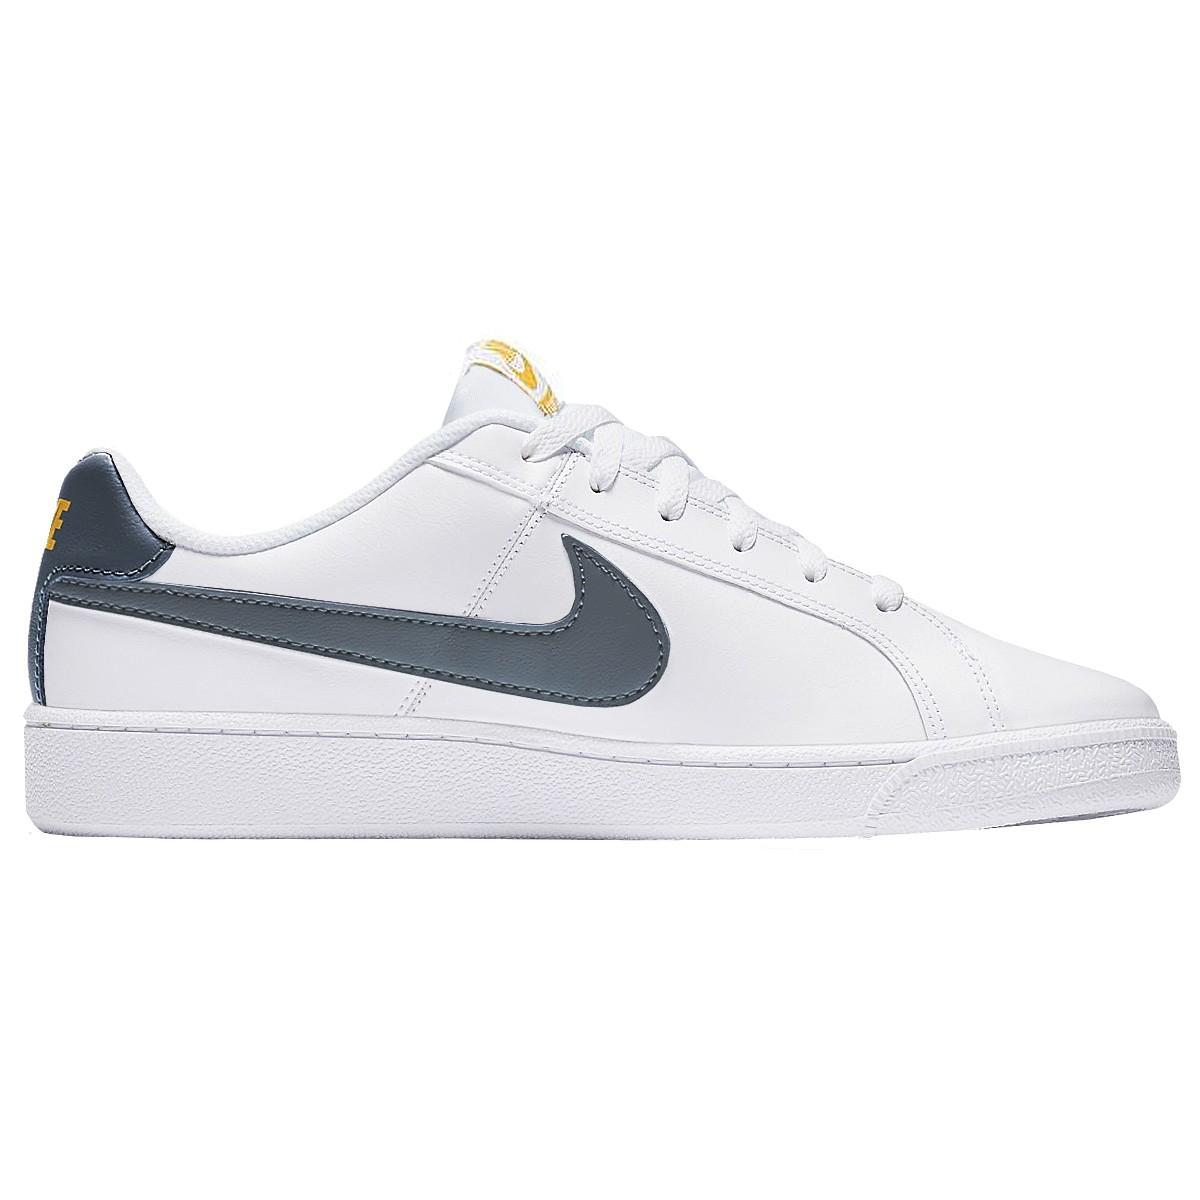 a64d237a3 Sneakers Nike Court Royale Hombre - Zapatos deportivos nike court royale  blancas hombre